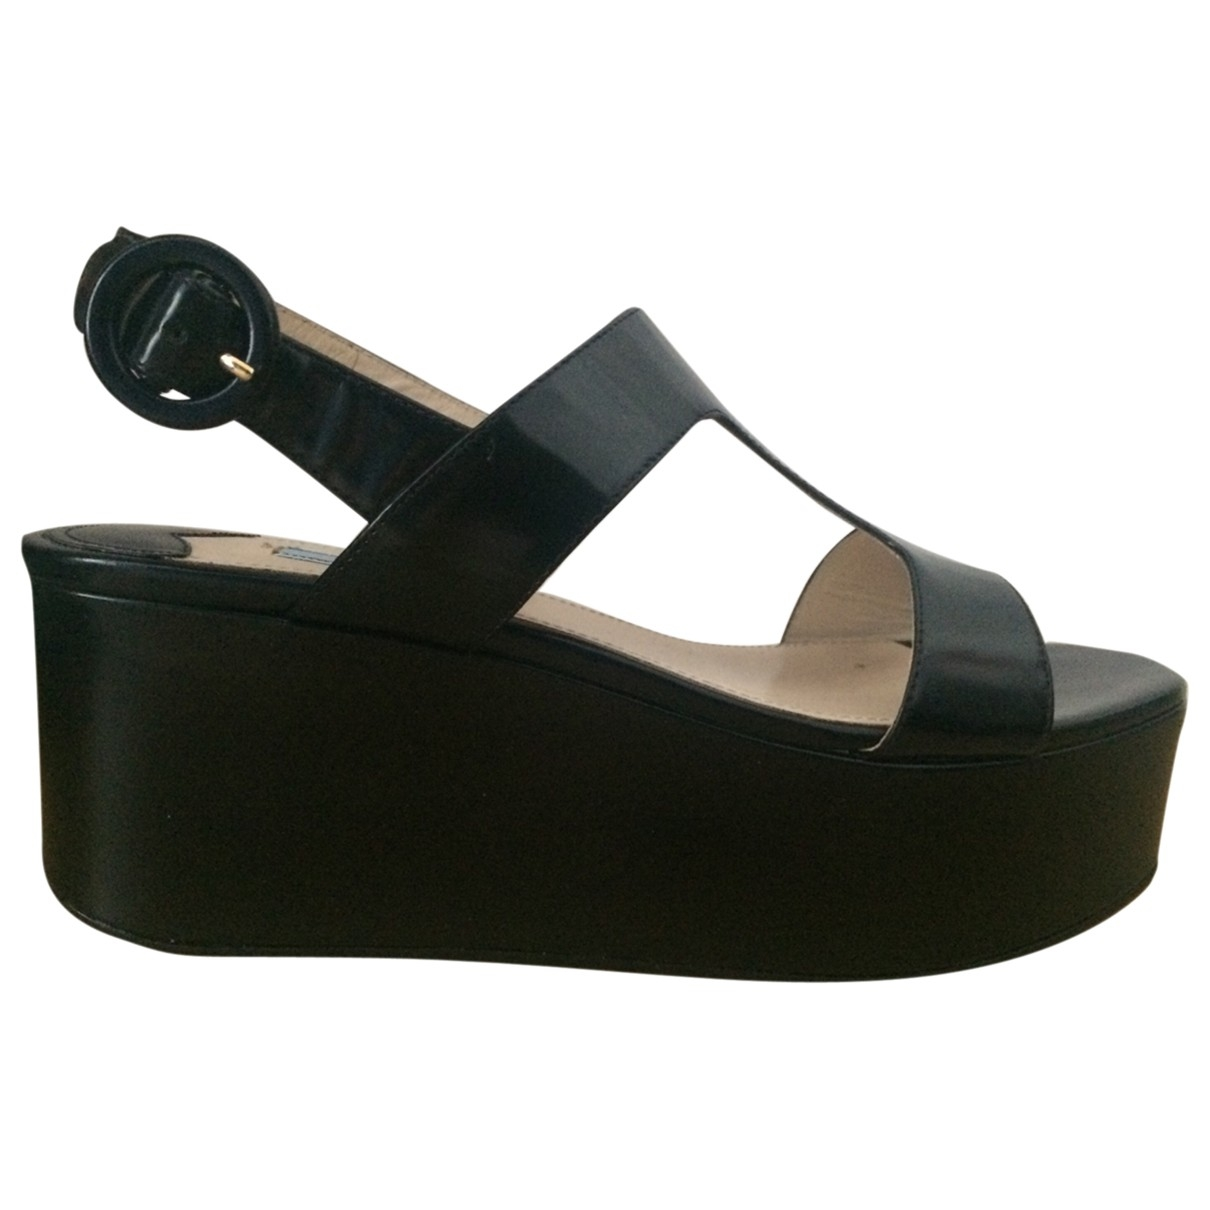 Prada \N Black Patent leather Sandals for Women 39 EU